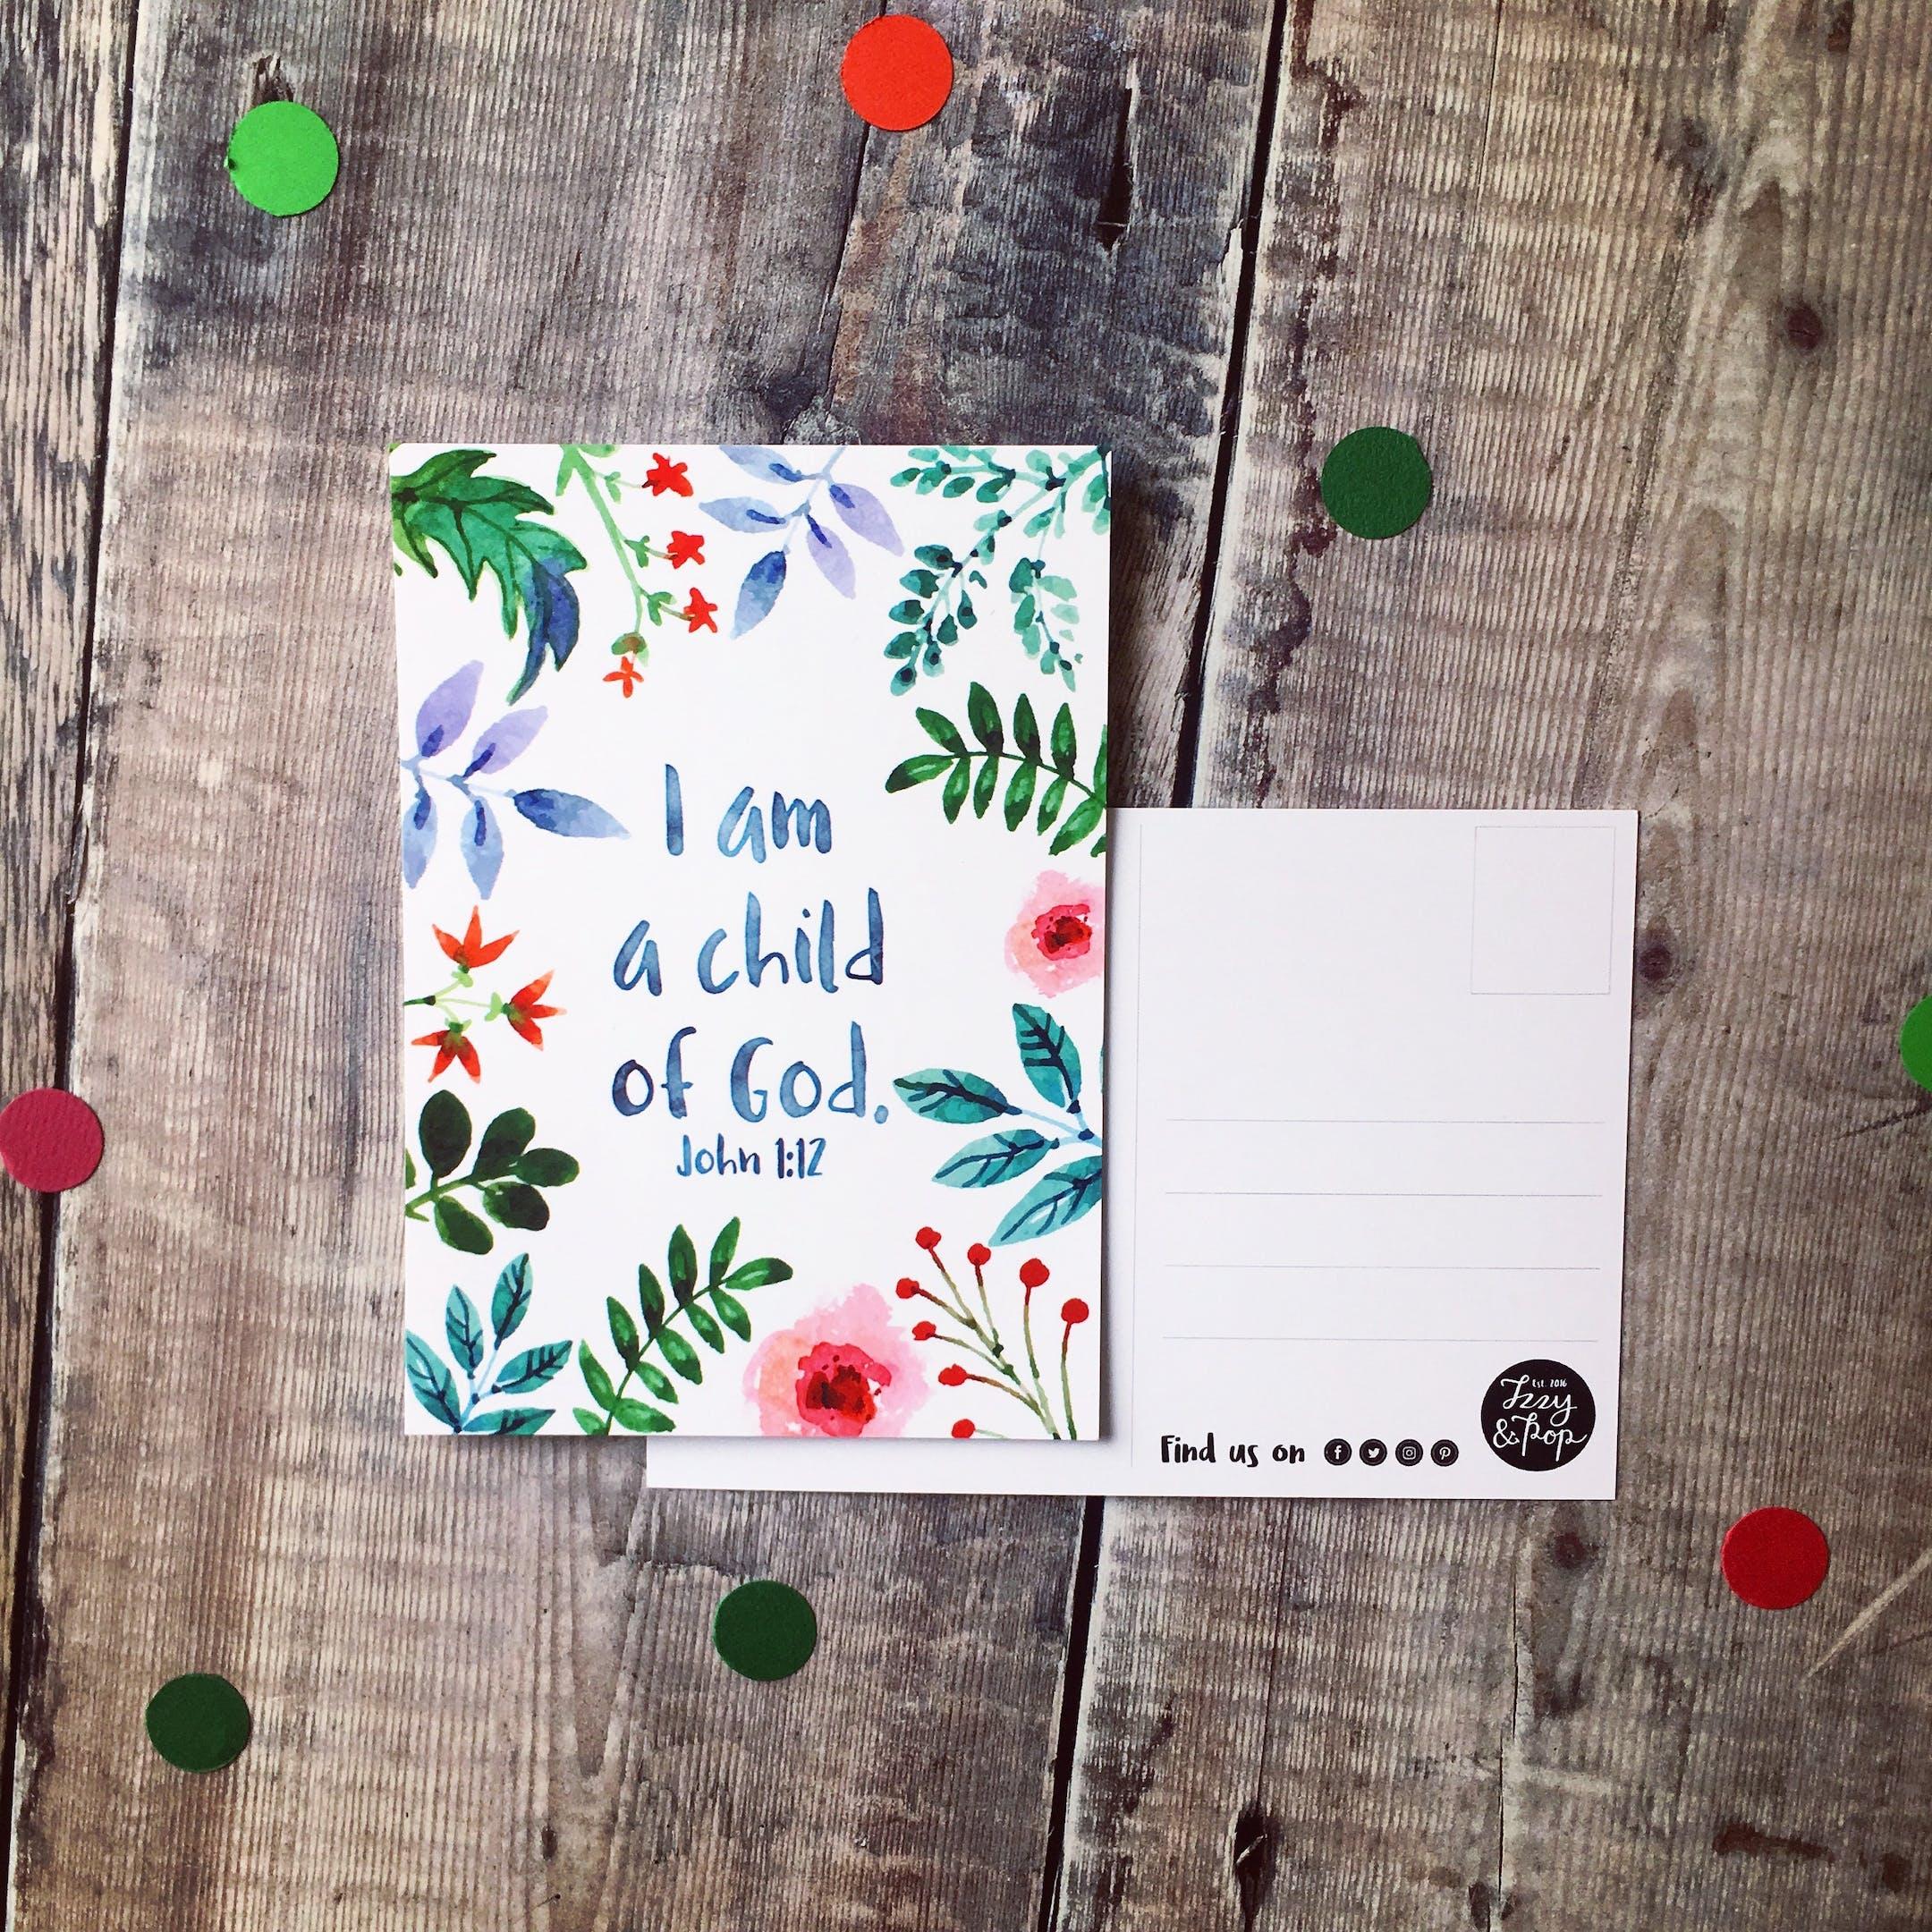 I Am A Child Of God Encouragement Postcard - Izzy and Pop